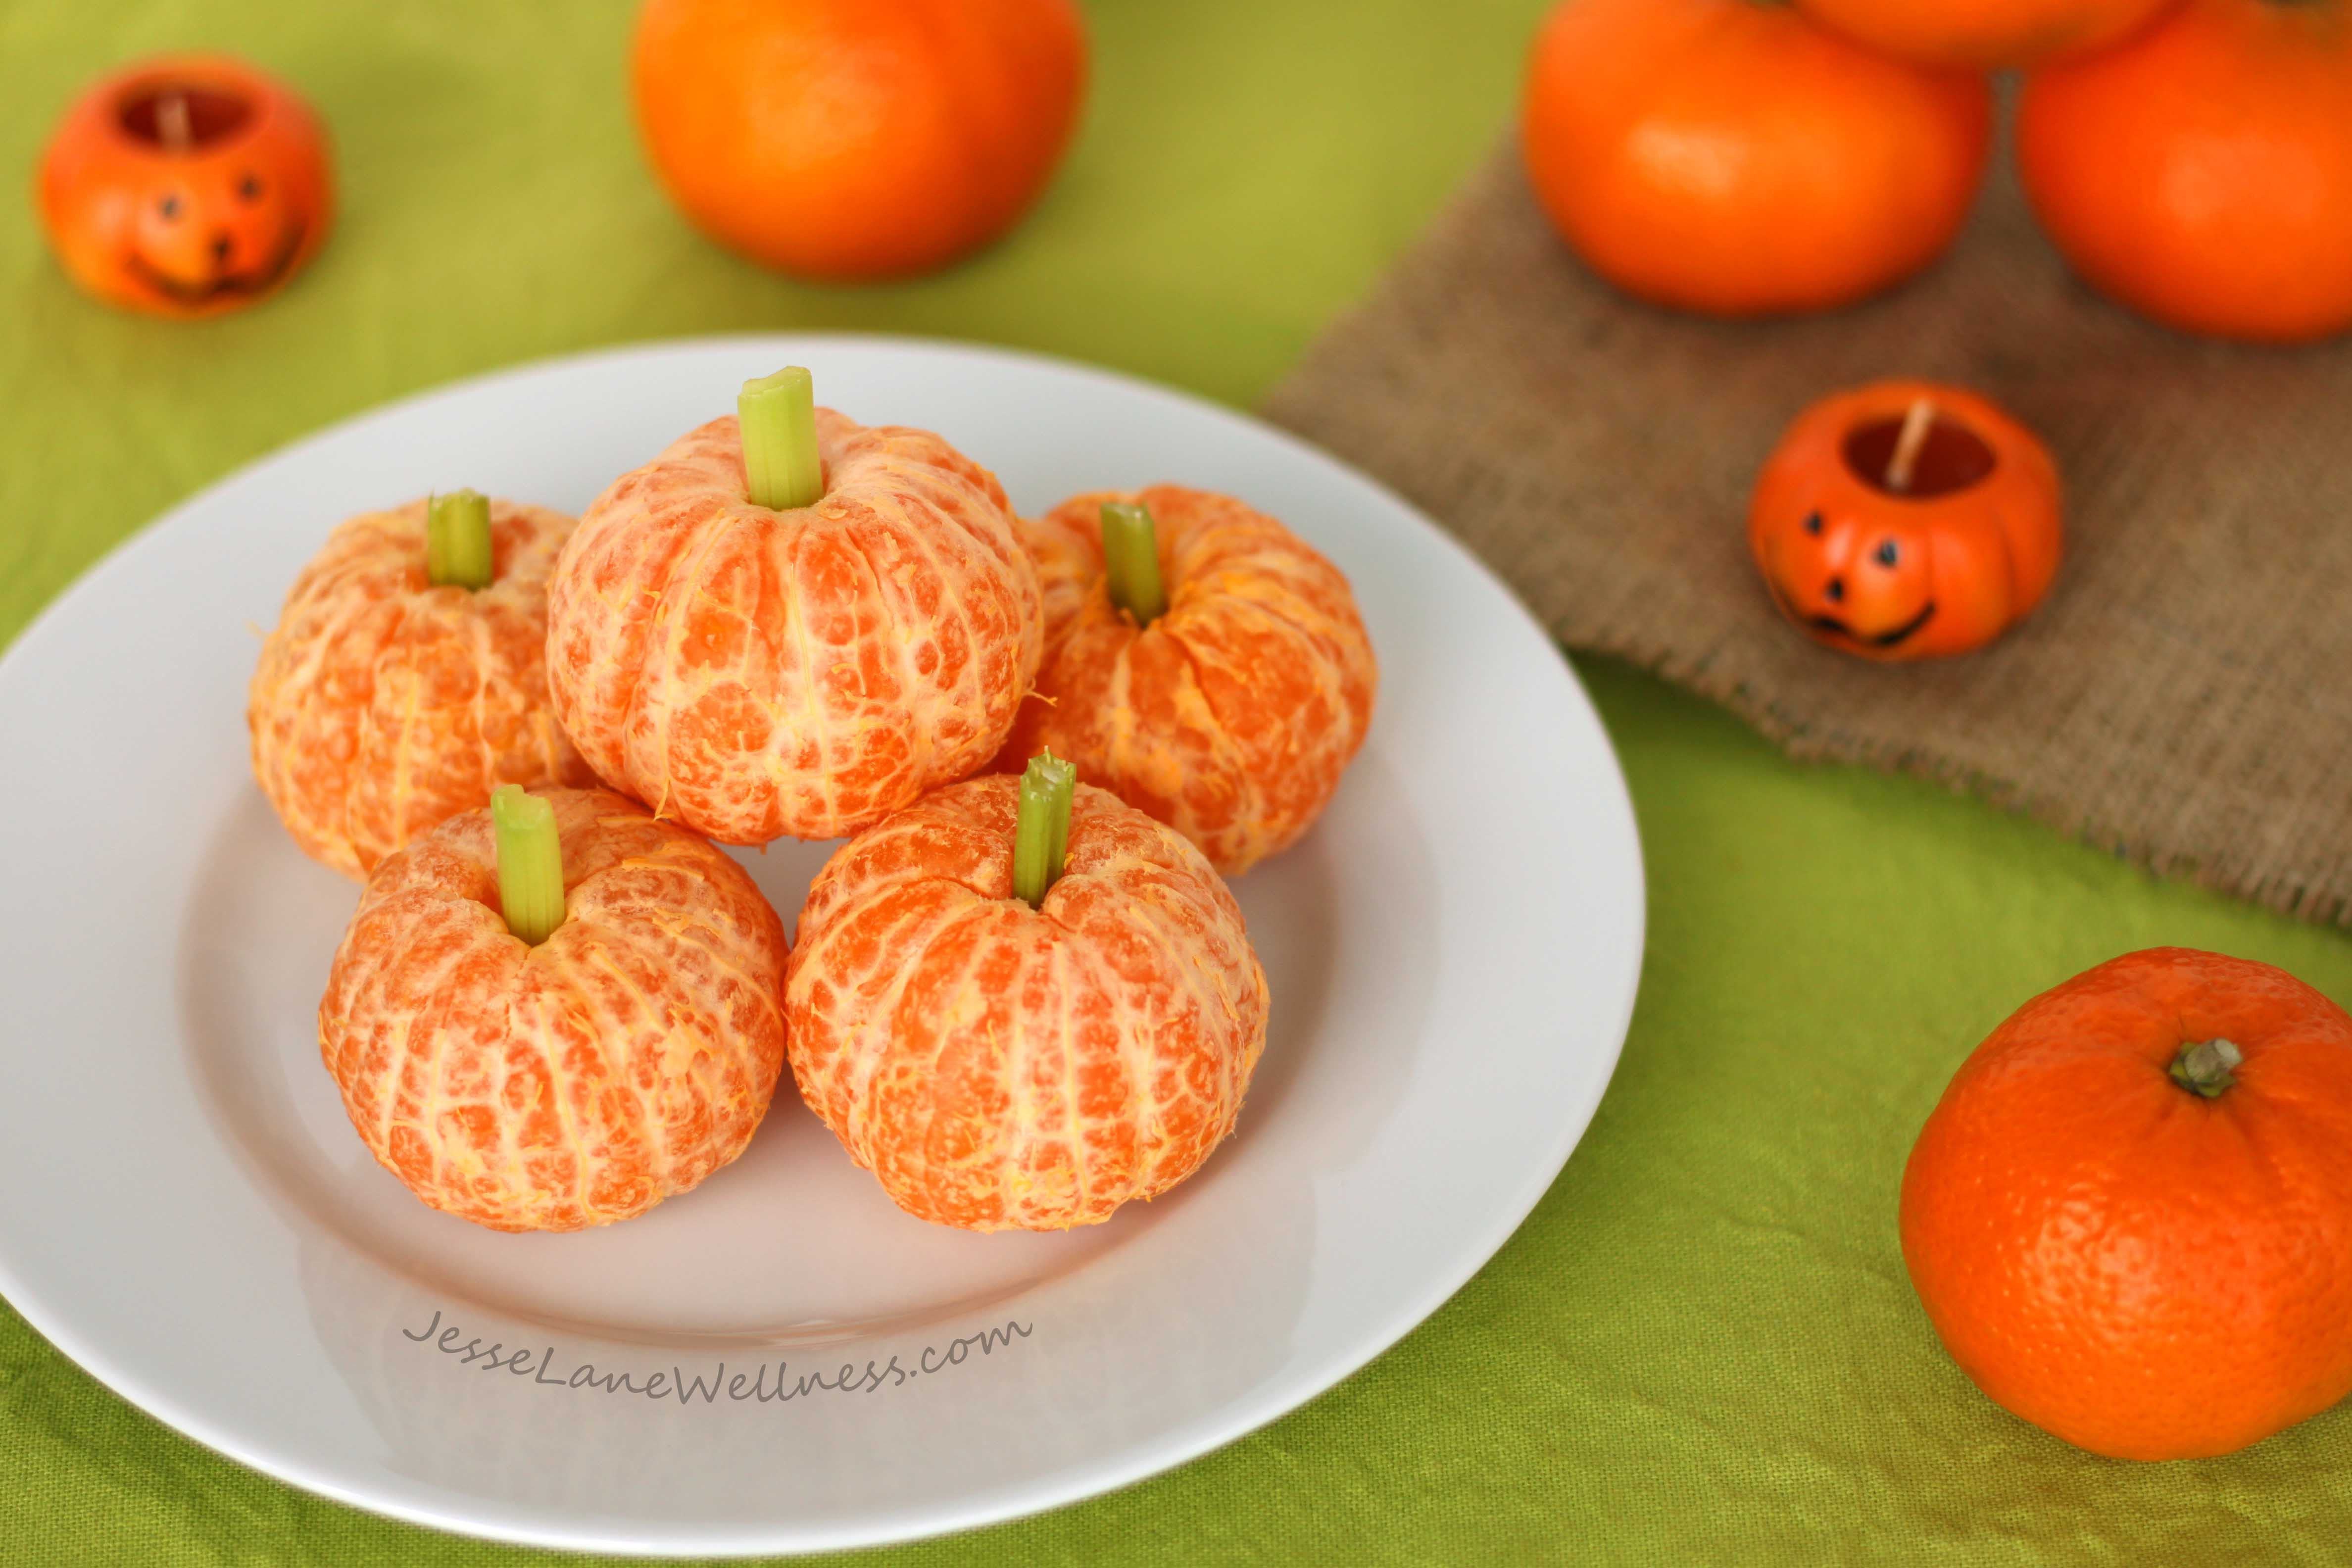 Halloween Healthy Snacks  Healthy Halloween Snacks Roundup by Jesse Lane Wellness